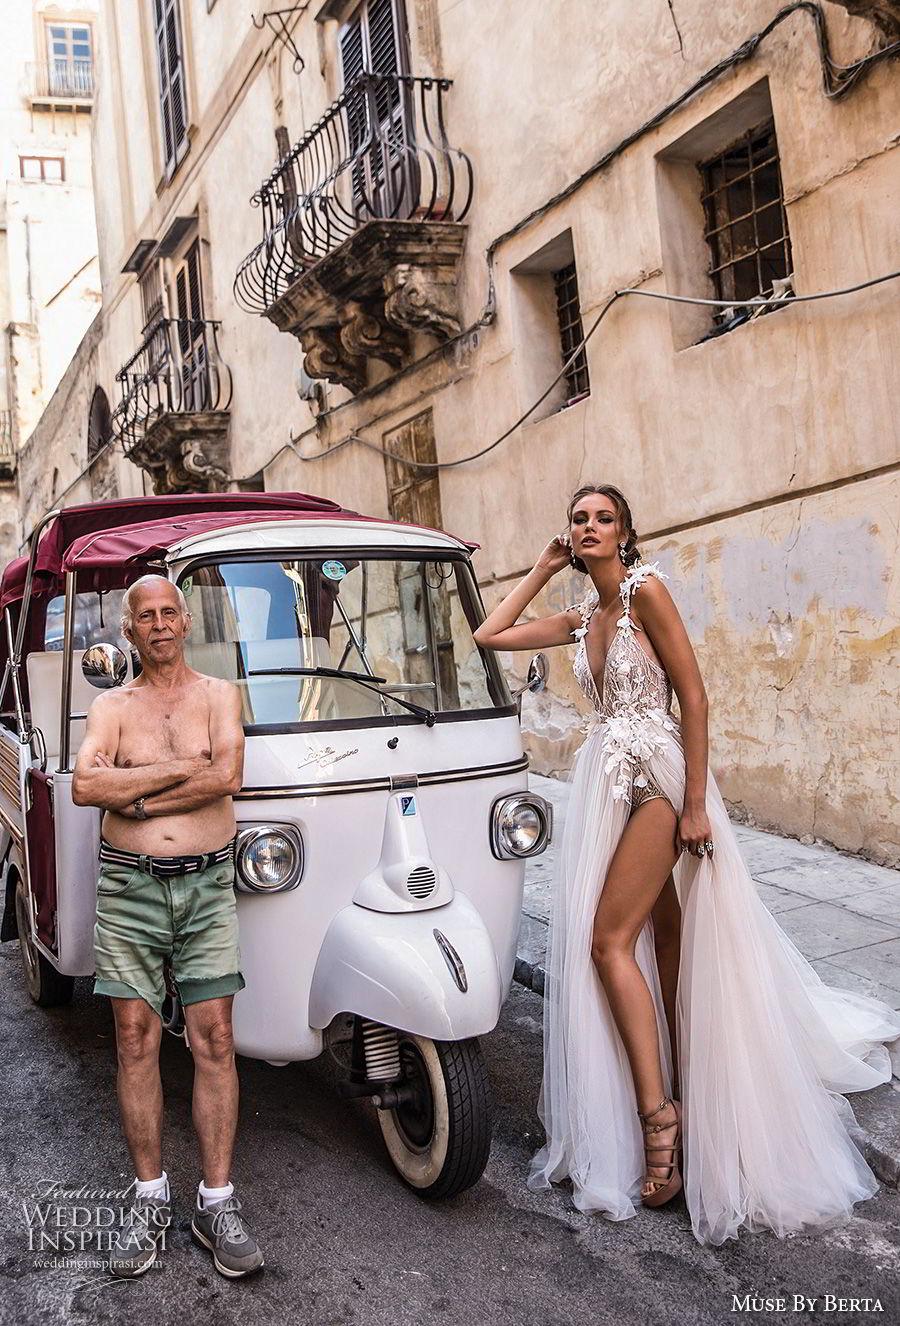 muse-berta-2018-bridal-sleeveless-deep-v-neck-heavily-embellished-high-slit-tulle-skirt-sexy-romantic-soft-a-line-wedding-dress-open-back-chapel-train-7-mv-